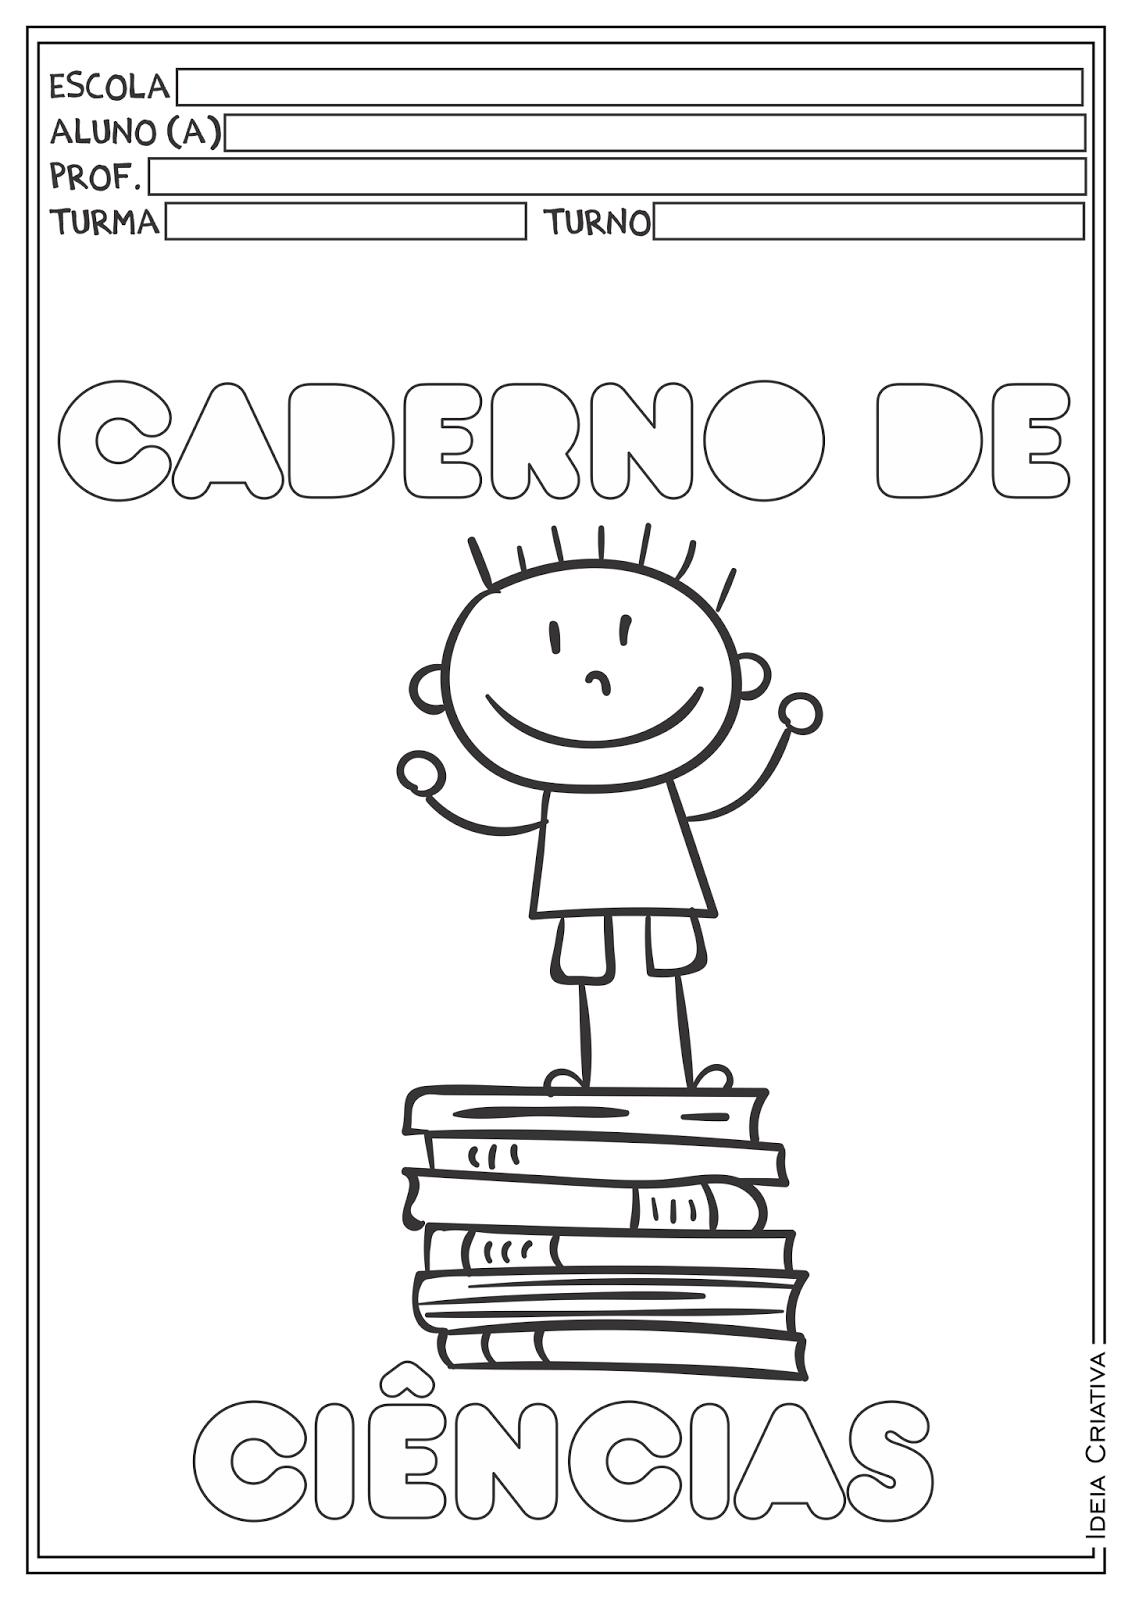 Capas para Cadernos para Ensino Fundamental